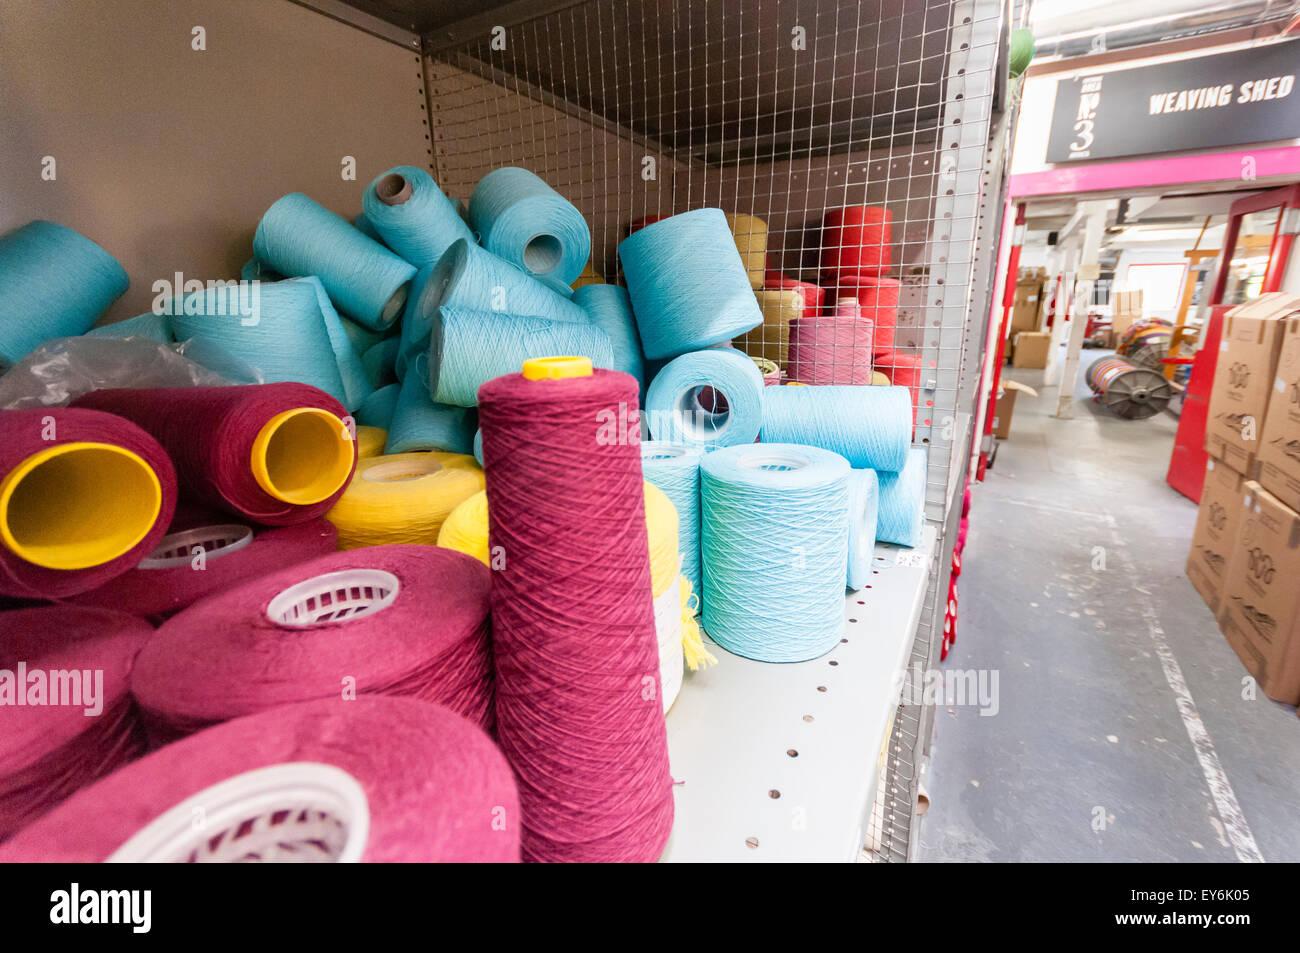 Colourful wools in Avoca Handweavers weaving factory - Stock Image